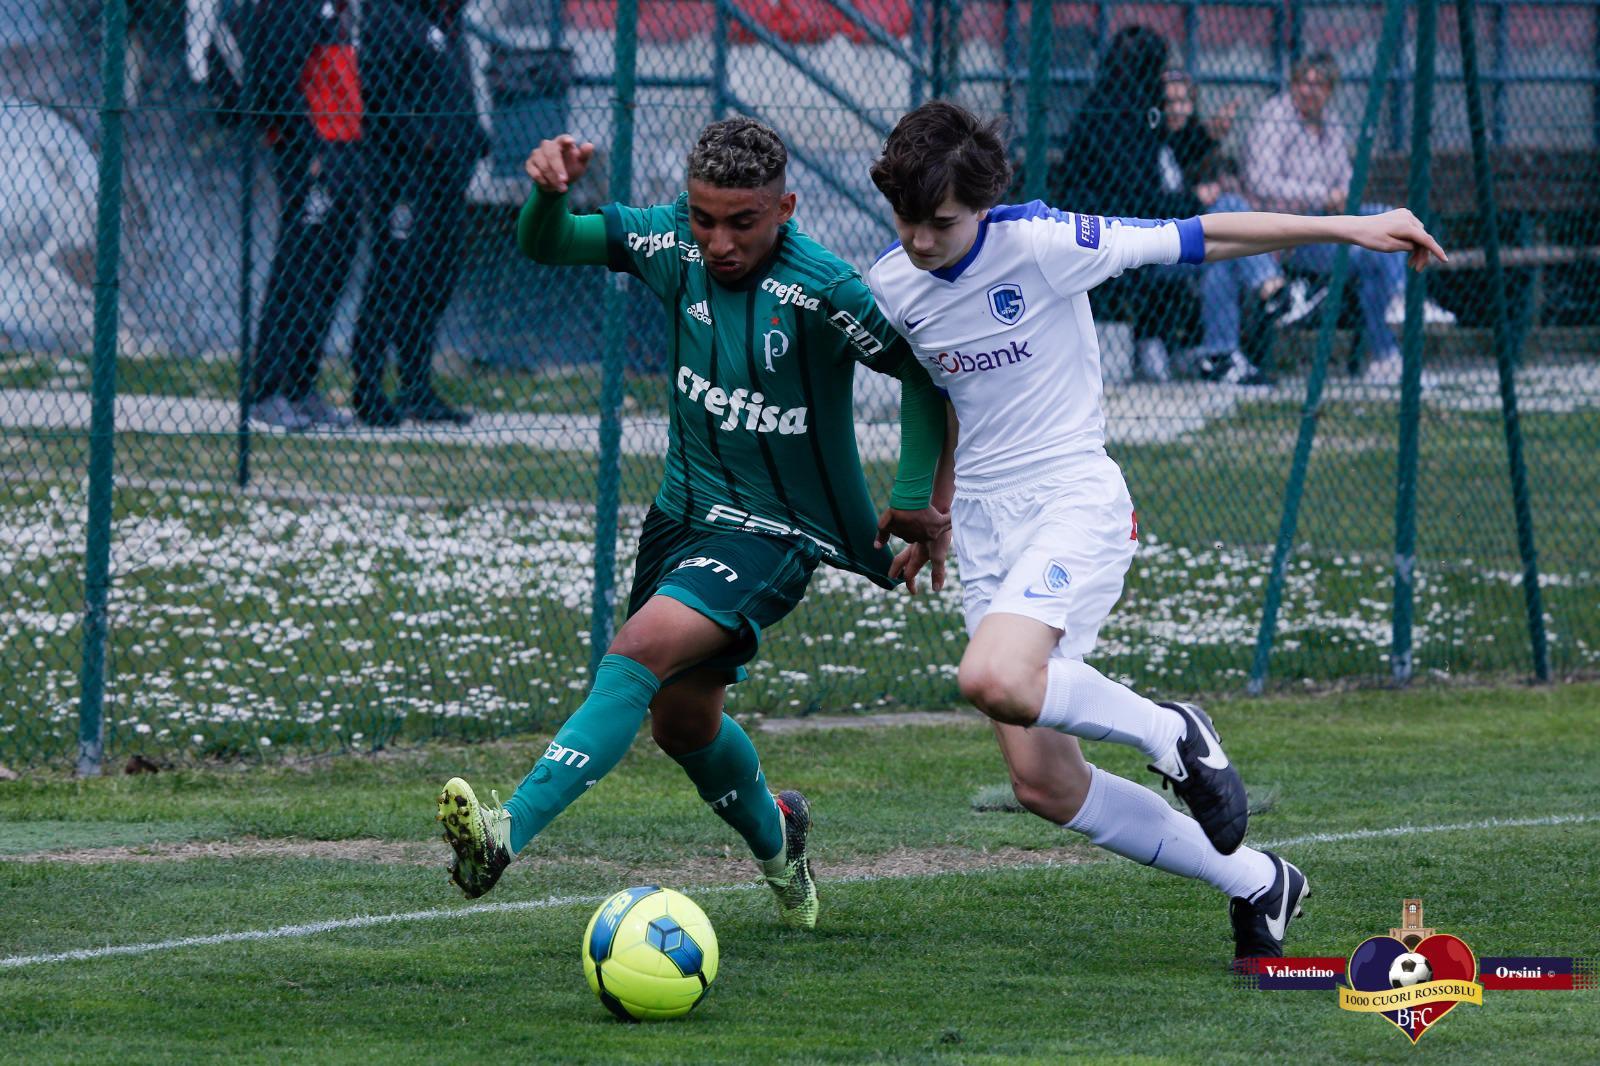 """We Love Football"": 2a Giornata del girone C - 29 Mar"